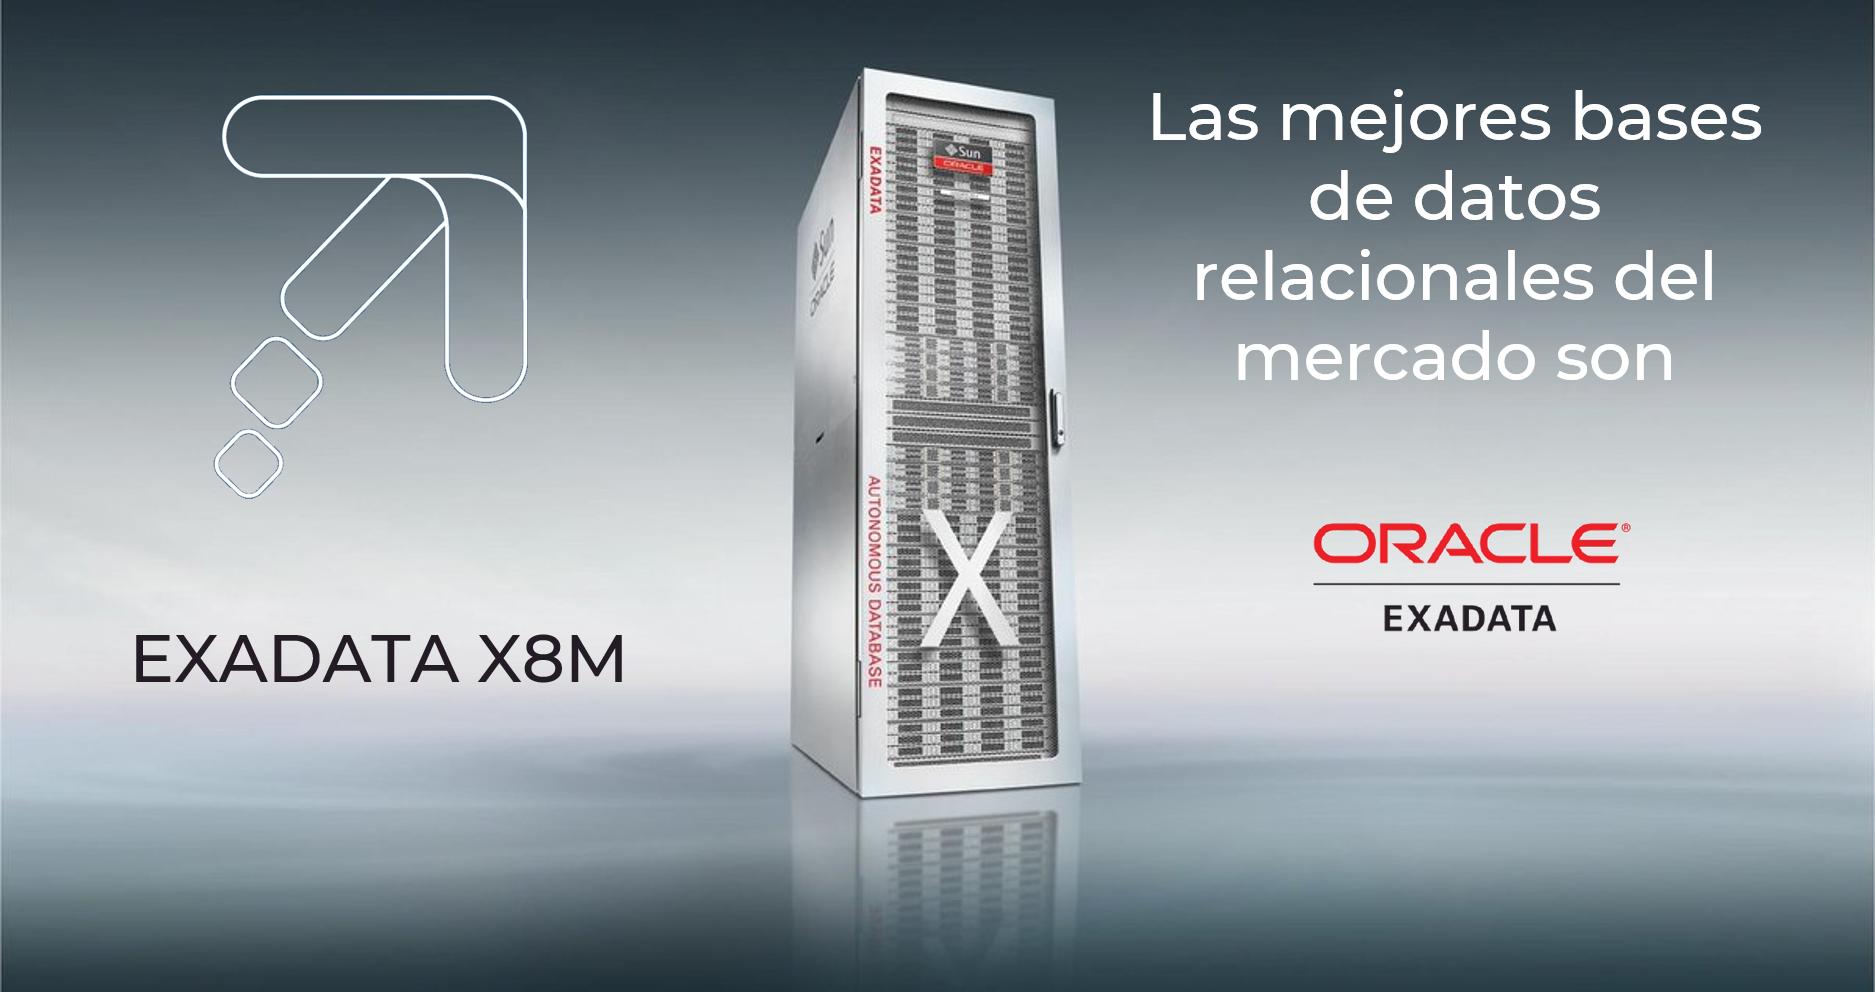 EXADATA X8M NETERIS